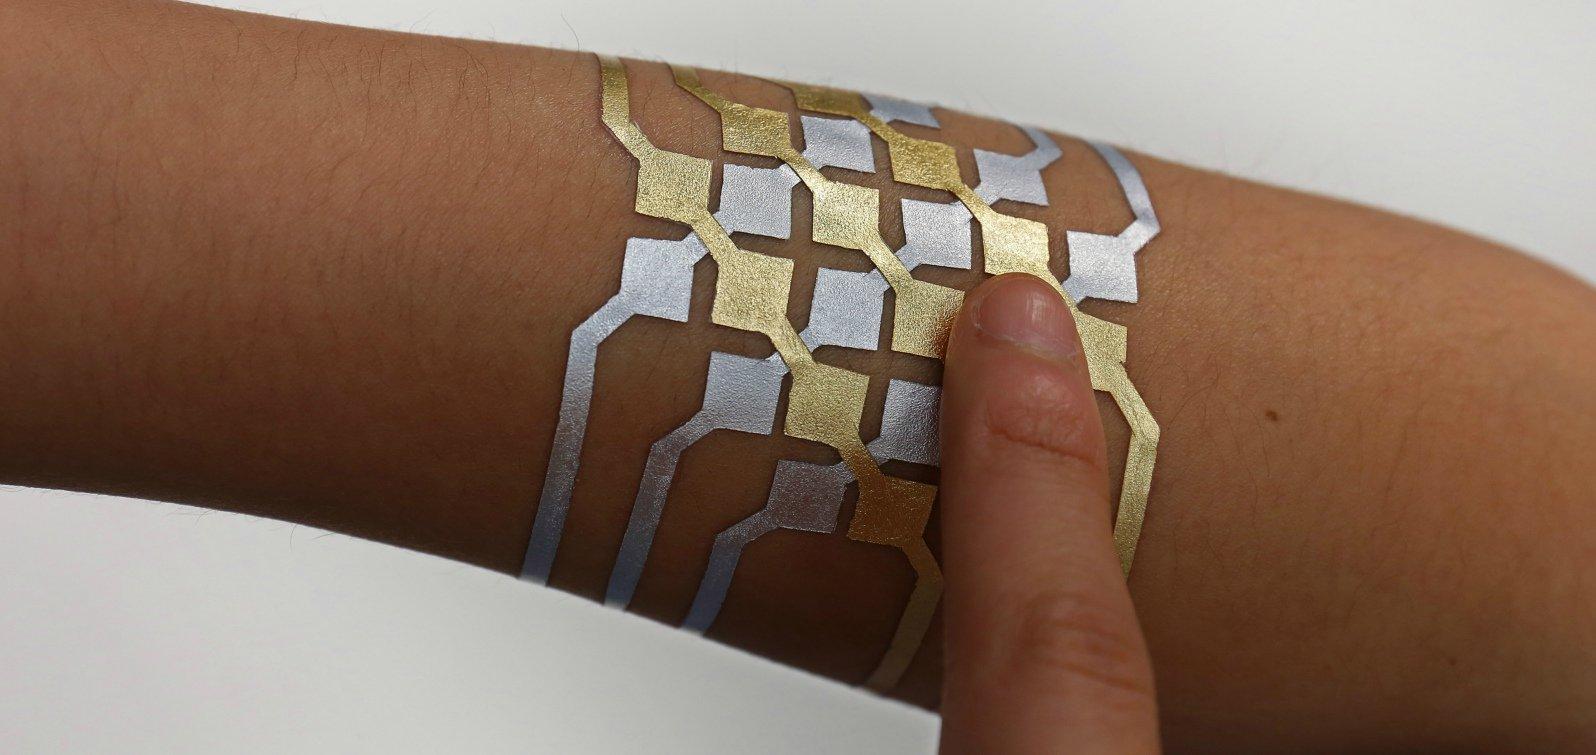 DuoSkin, i tatuaggi intelligenti simili a gioielli